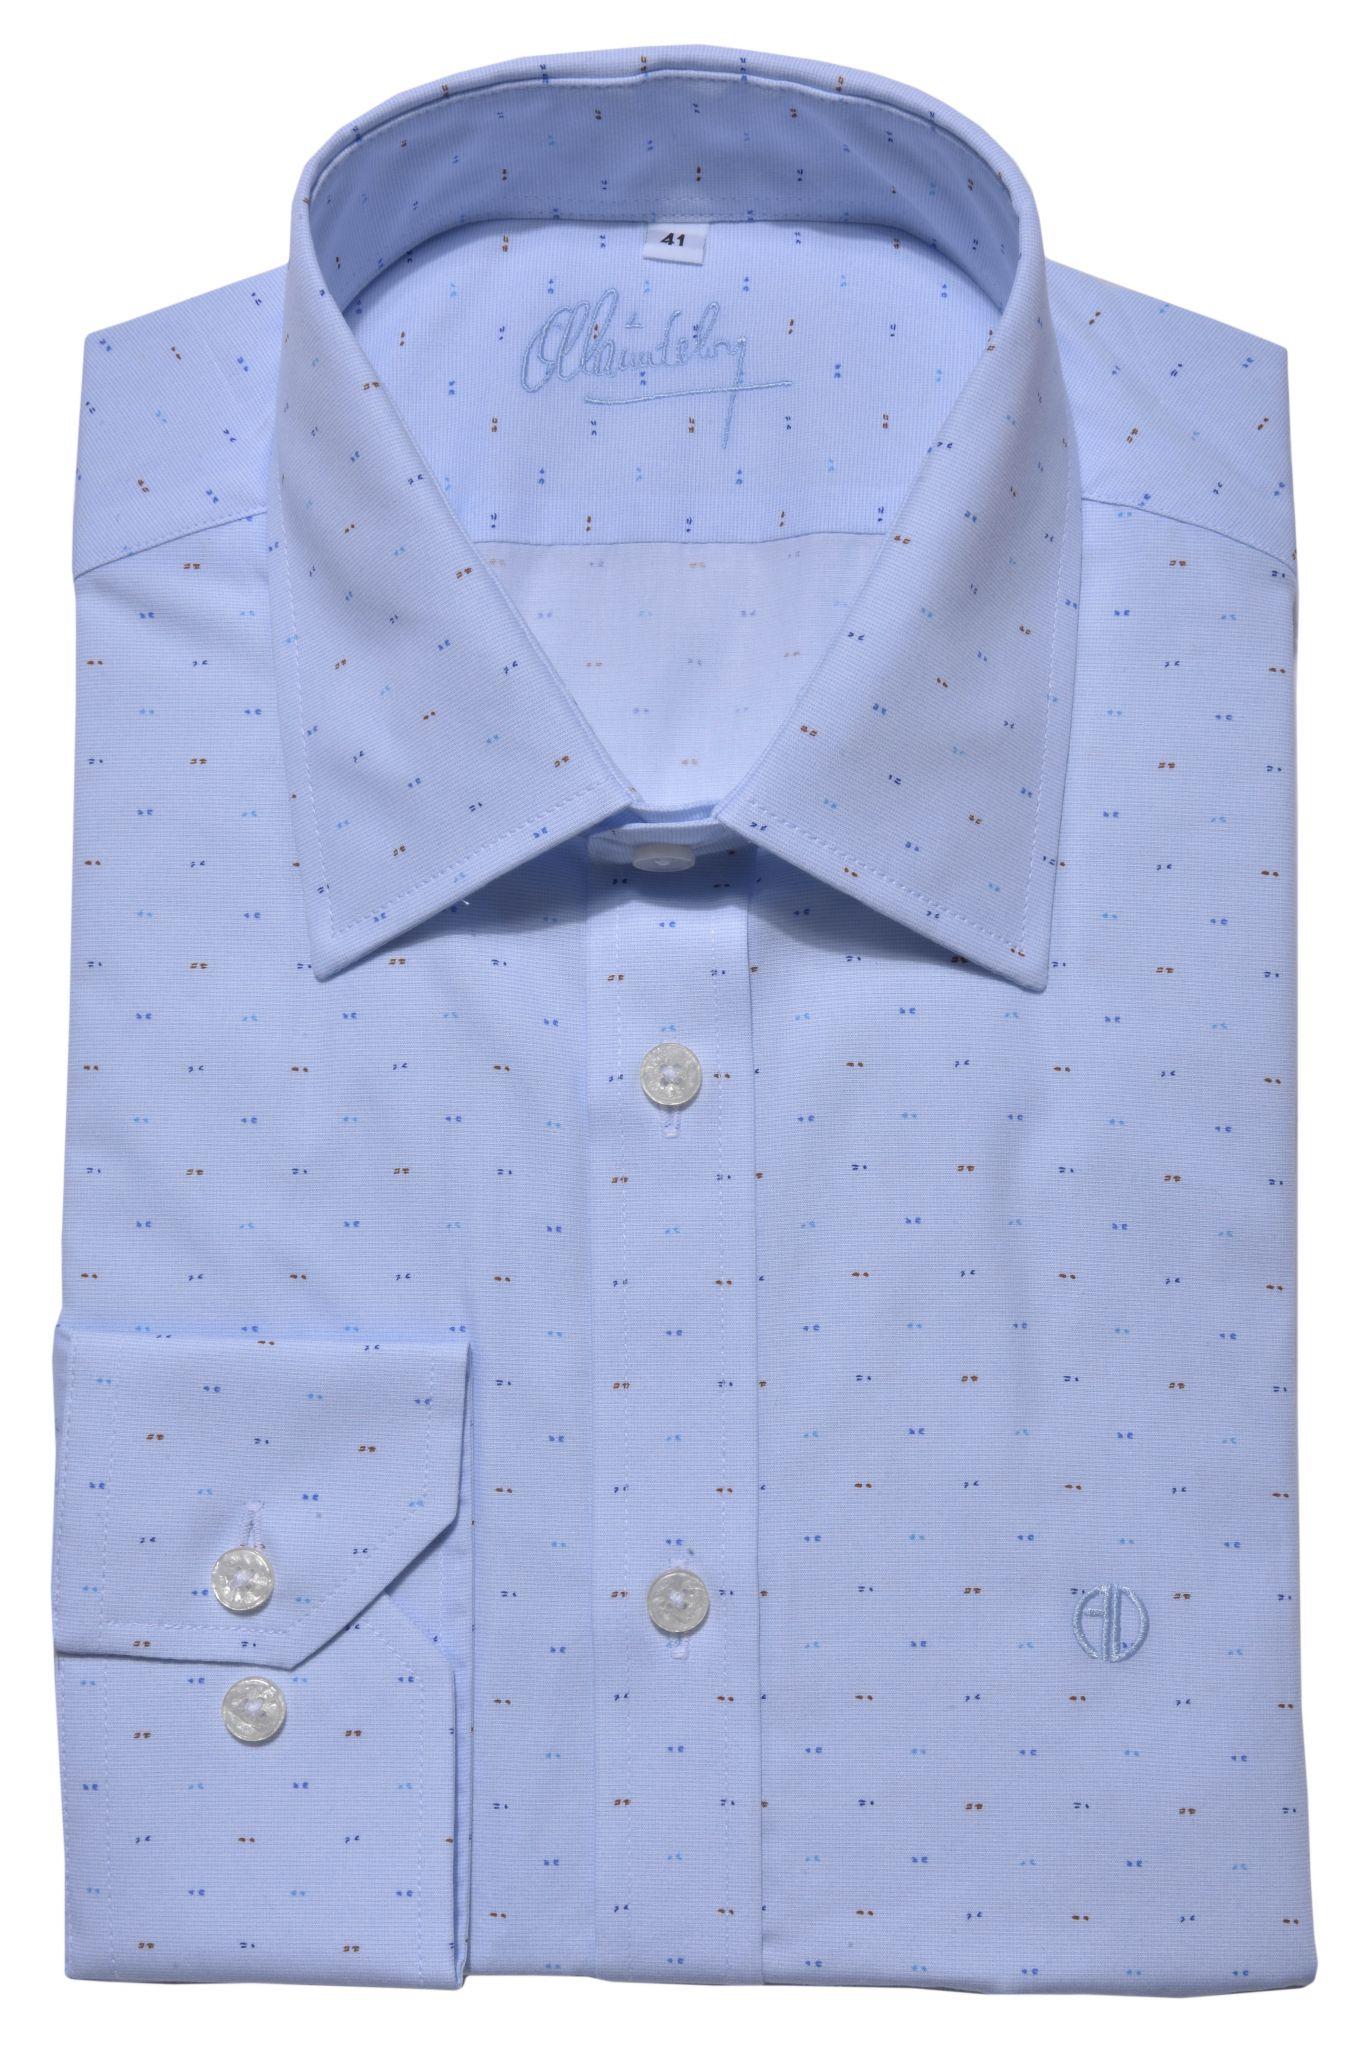 60824b0b6f6f Modrá business Extra Slim Fit košeľa - Košele - E-shop